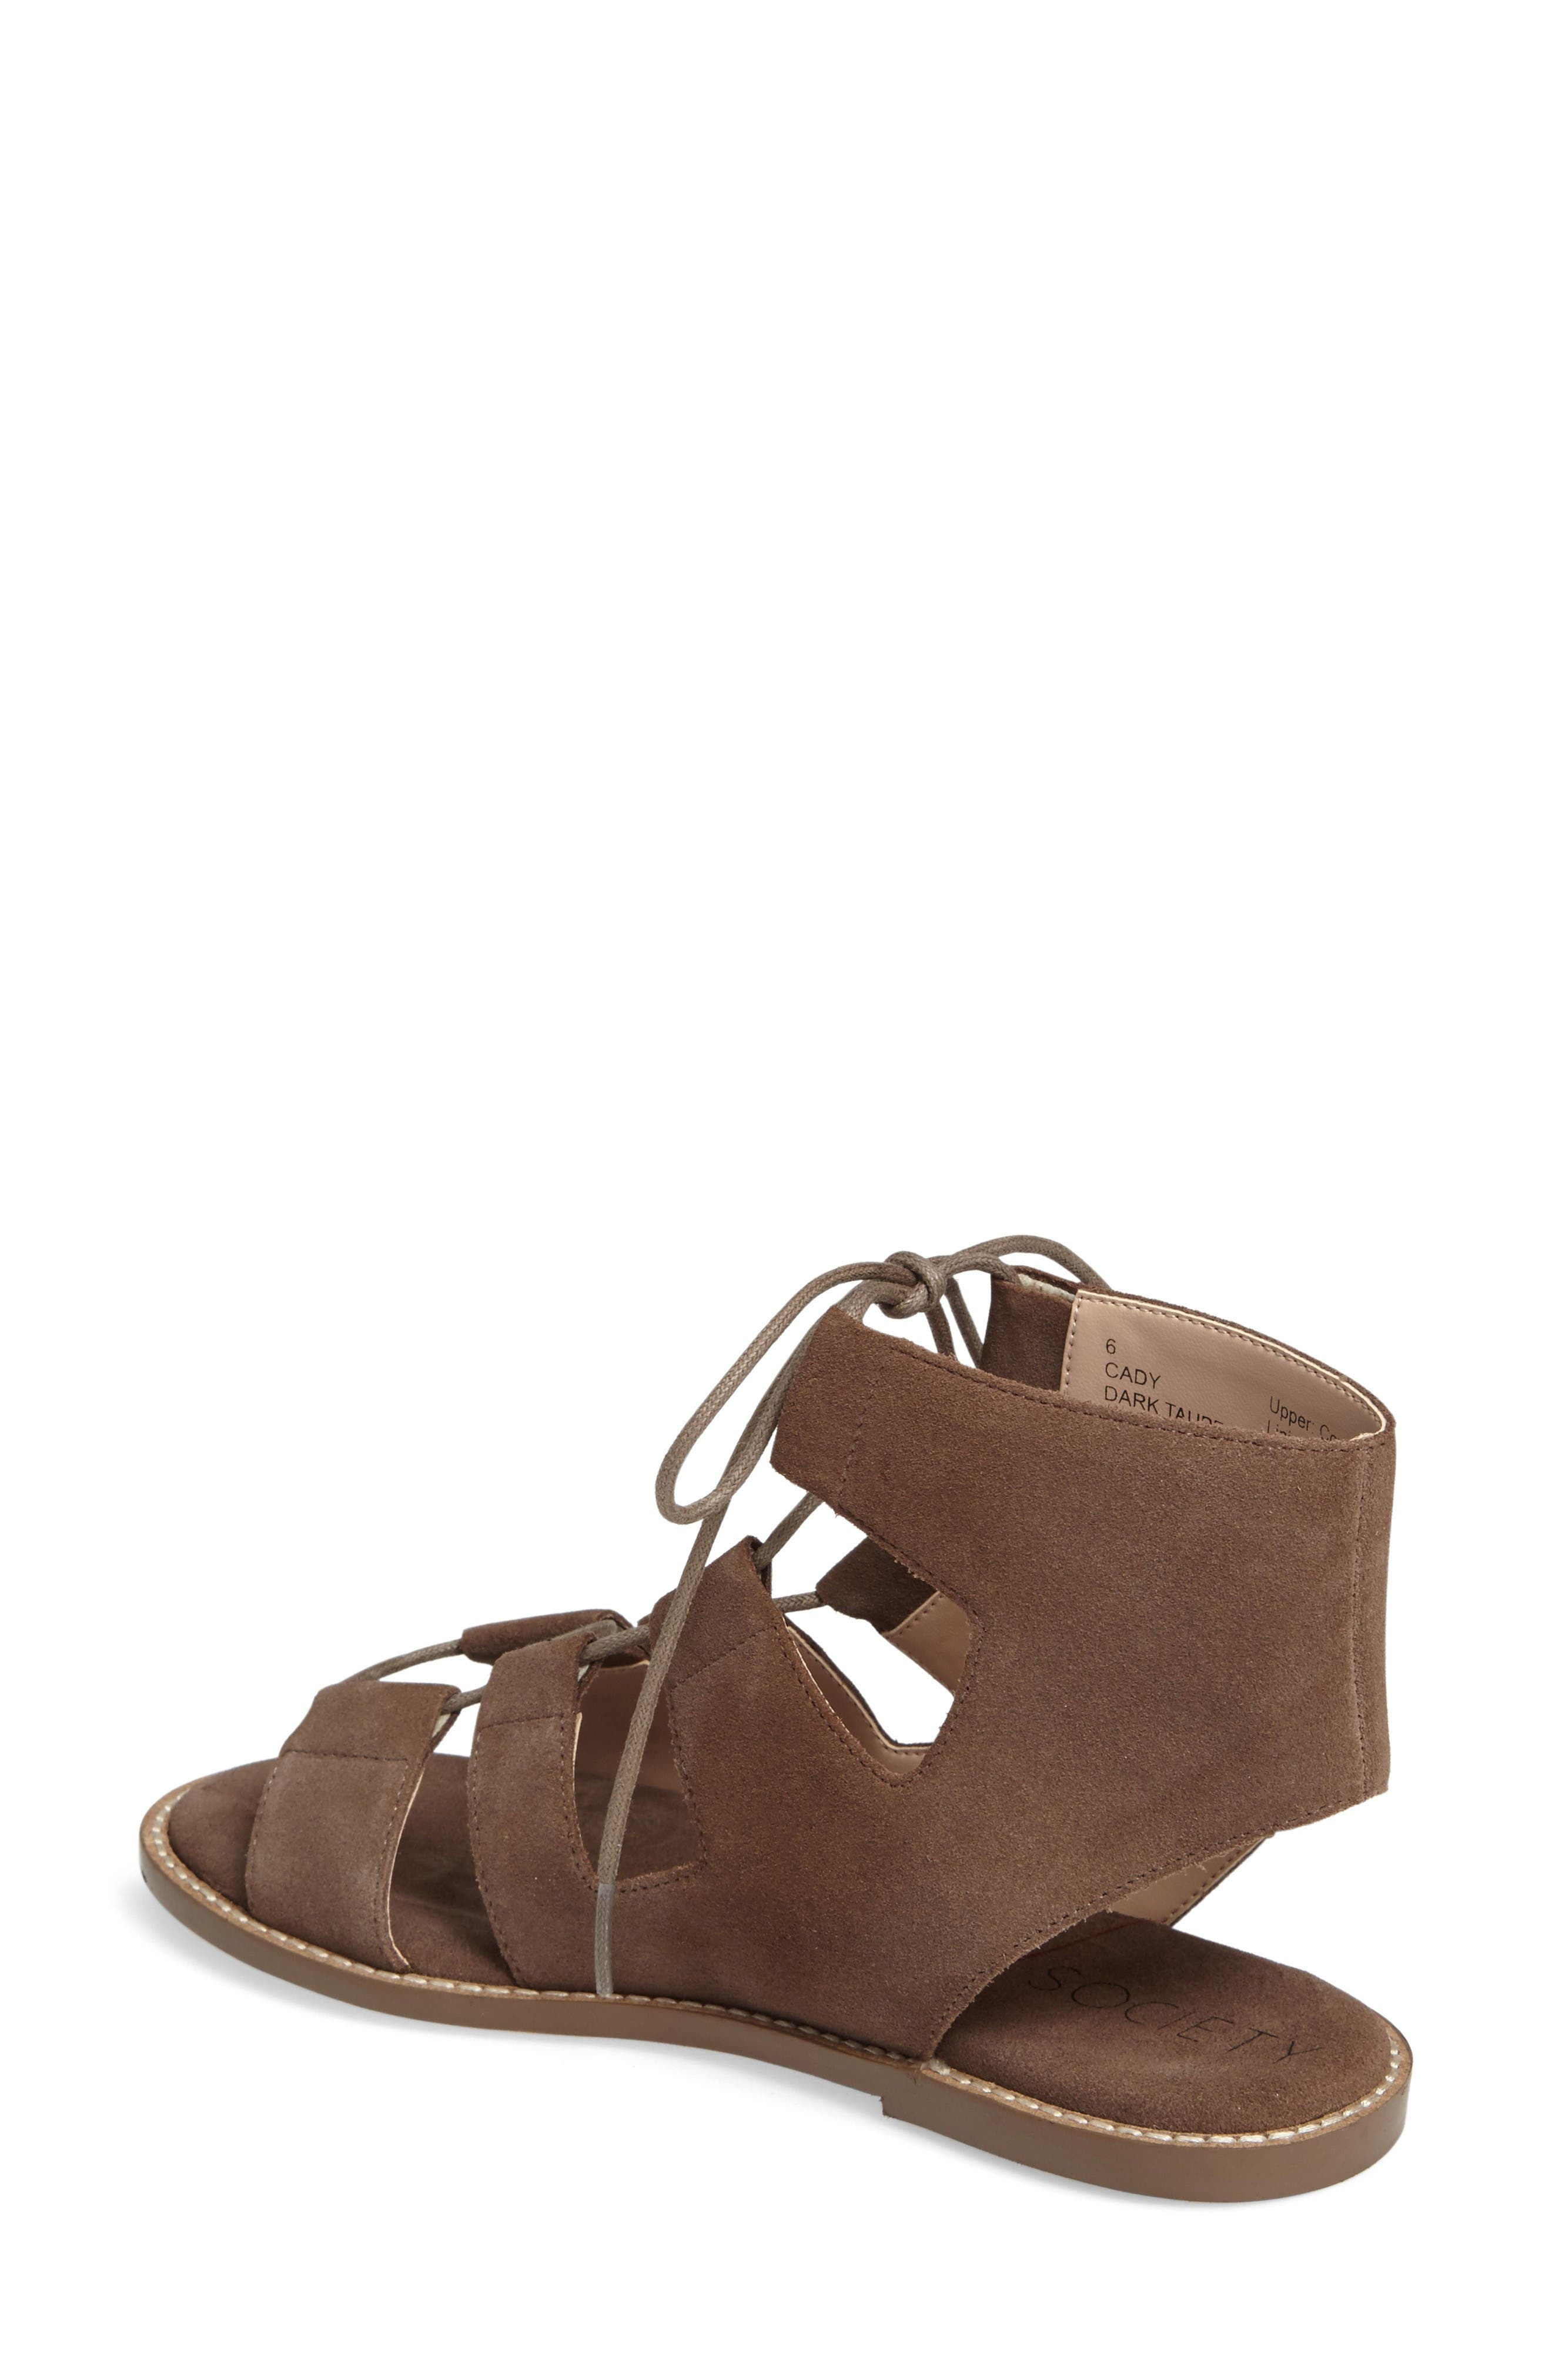 Alternate Image 2  - Sole Society 'Cady' Lace-Up Flat Sandal (Women)